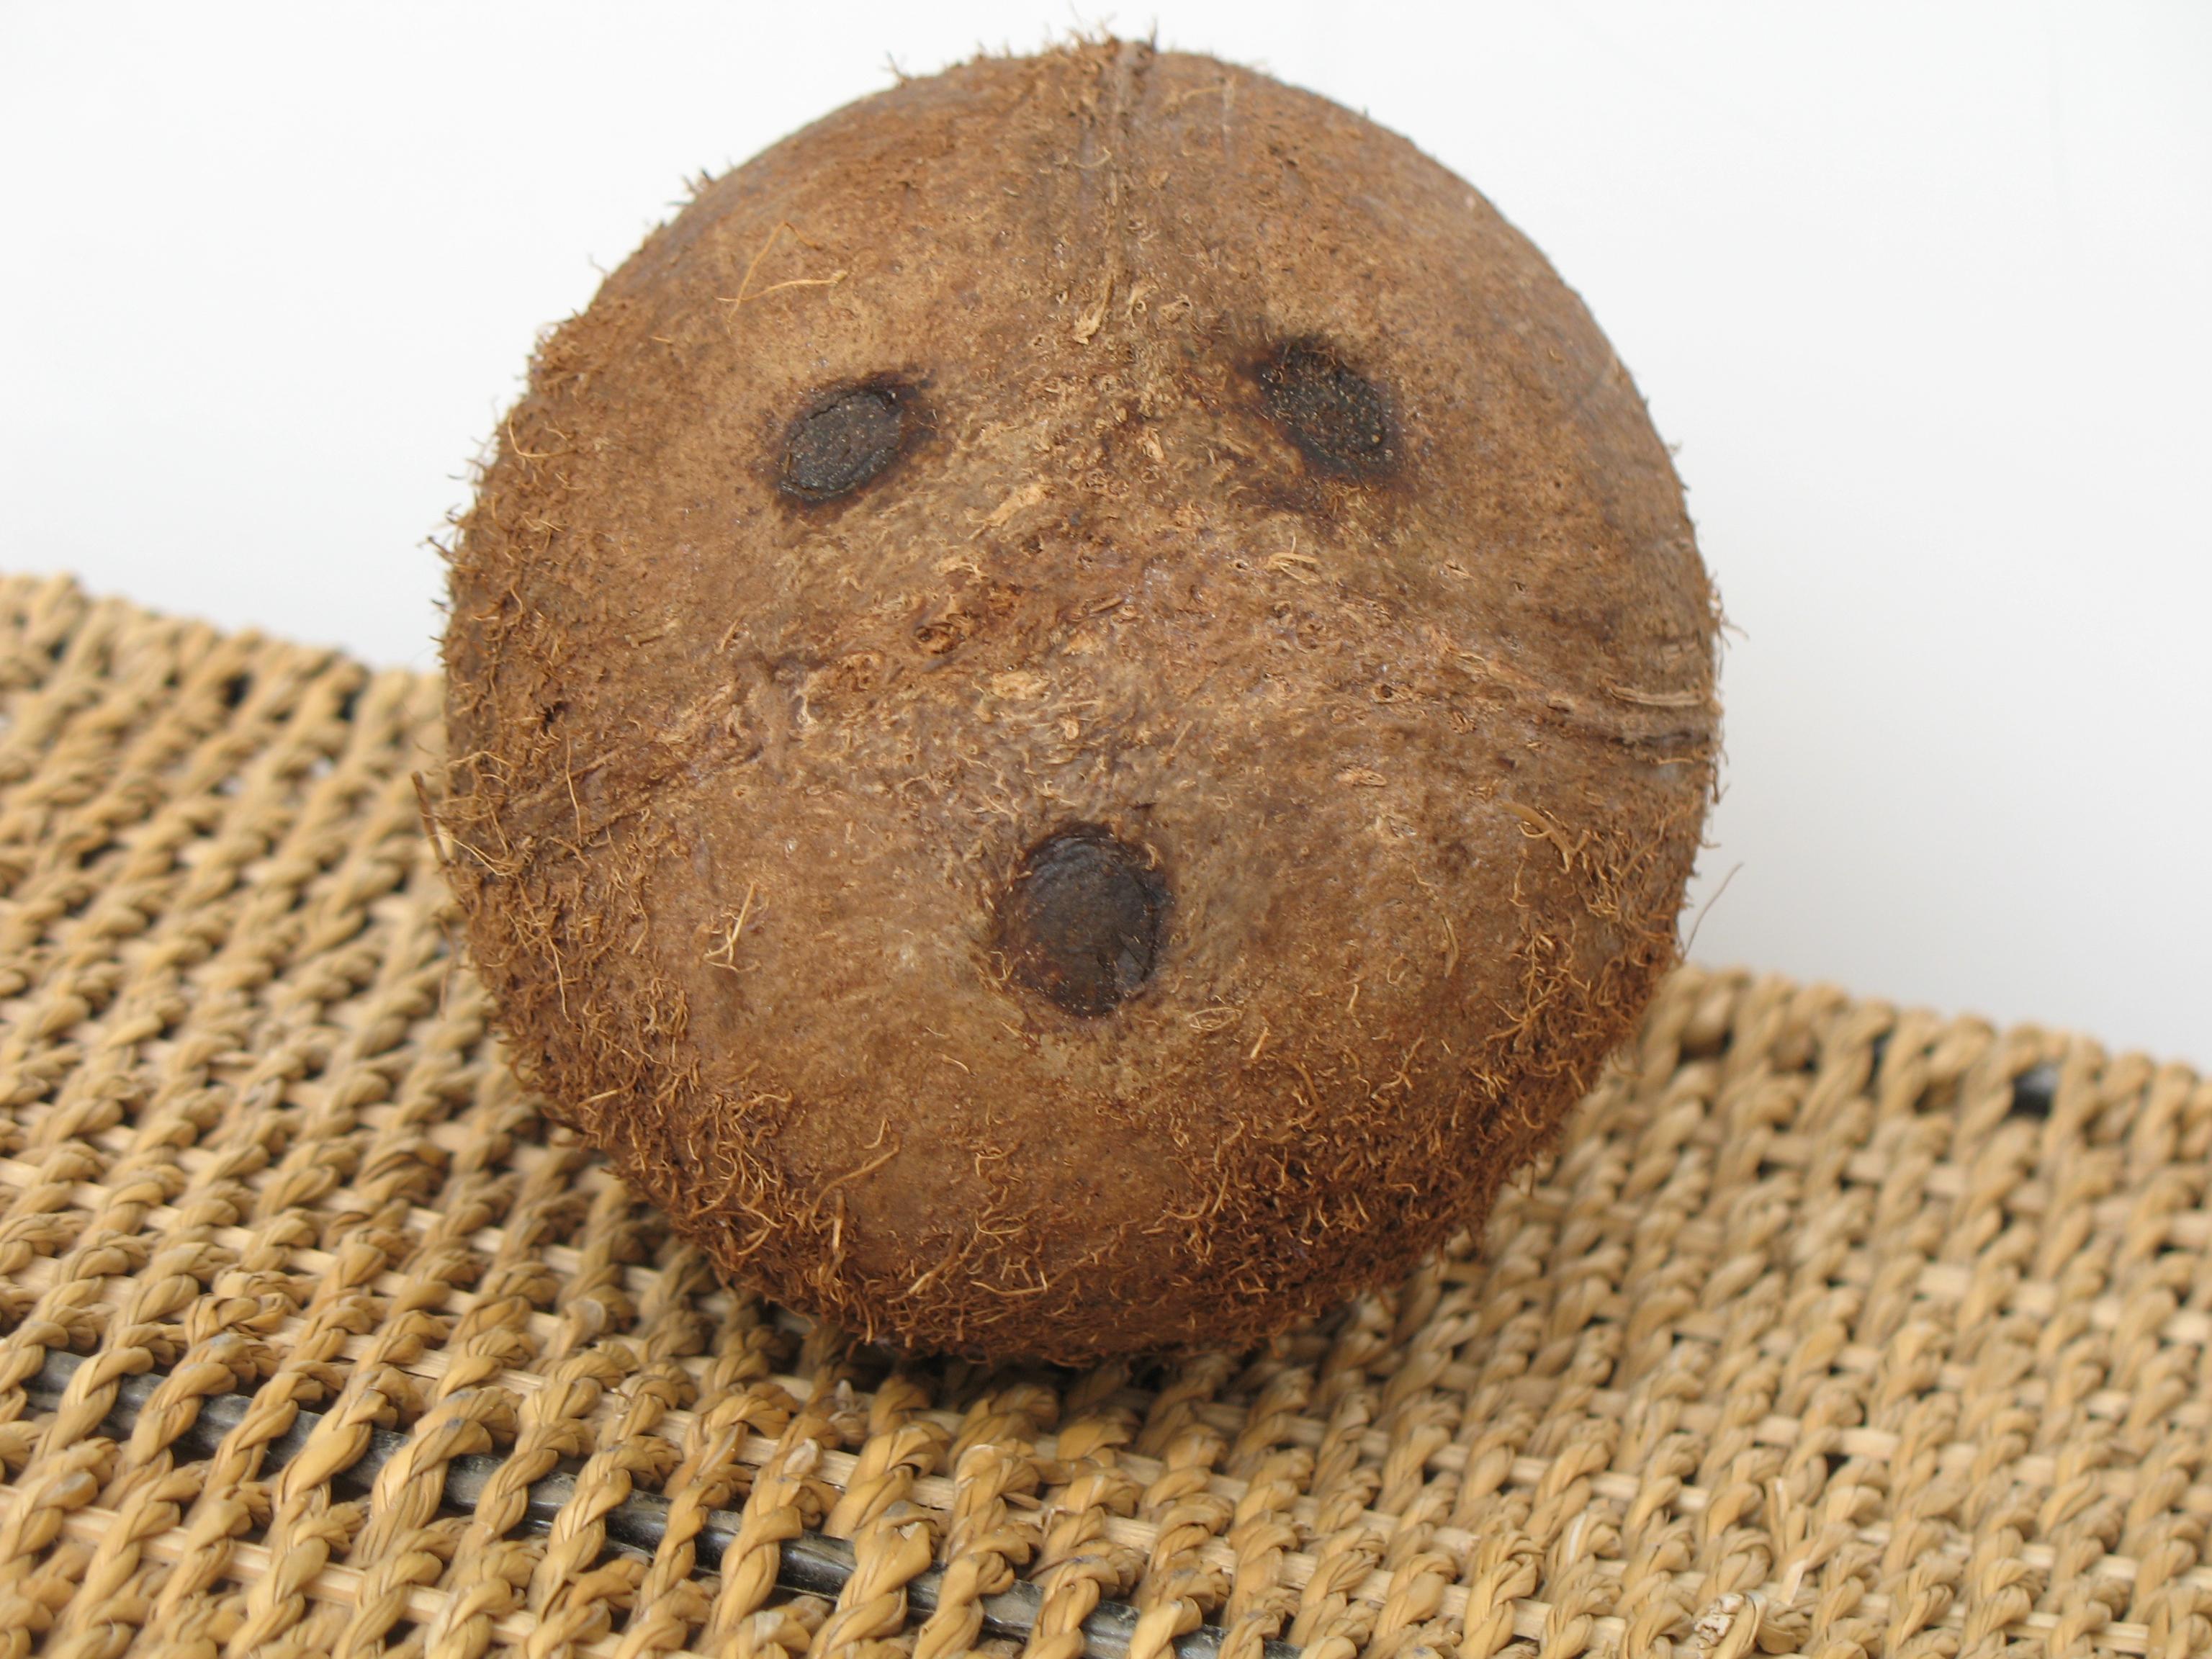 File:Coconut face (2201055109).jpg - Wikimedia Commons